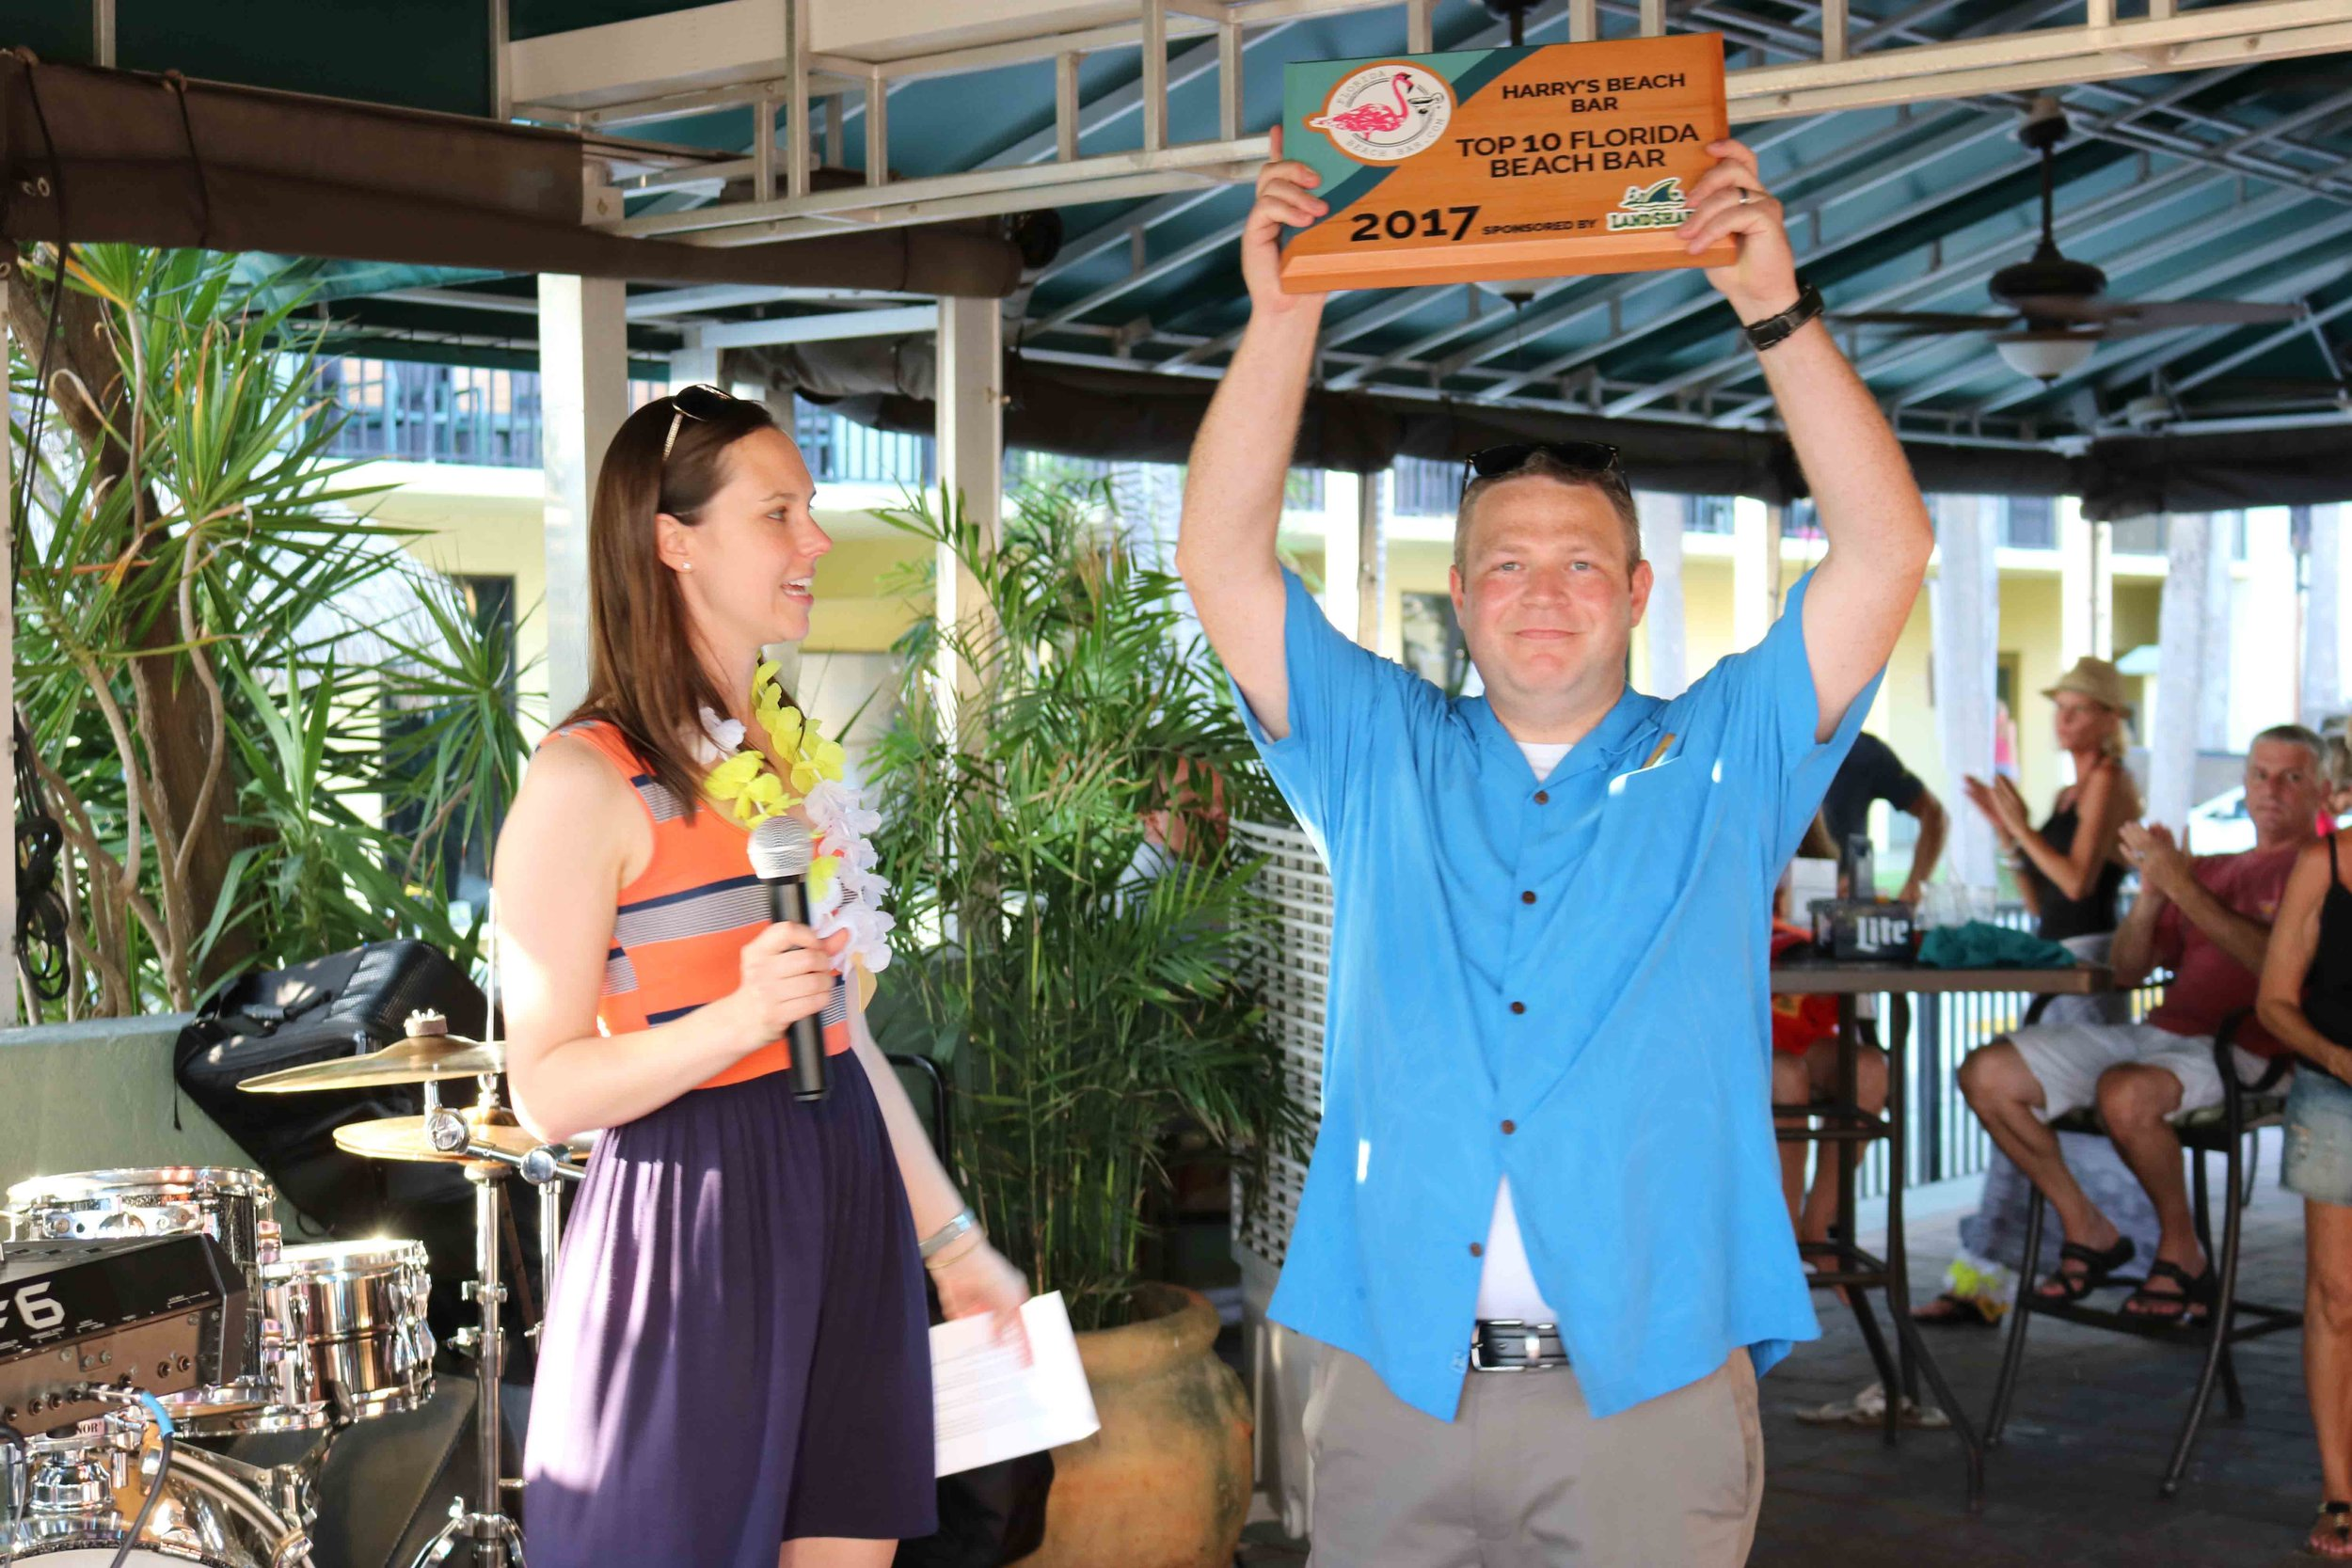 Chris, the General Manager, accepts the 2017 Top Florida Beach Bar award.